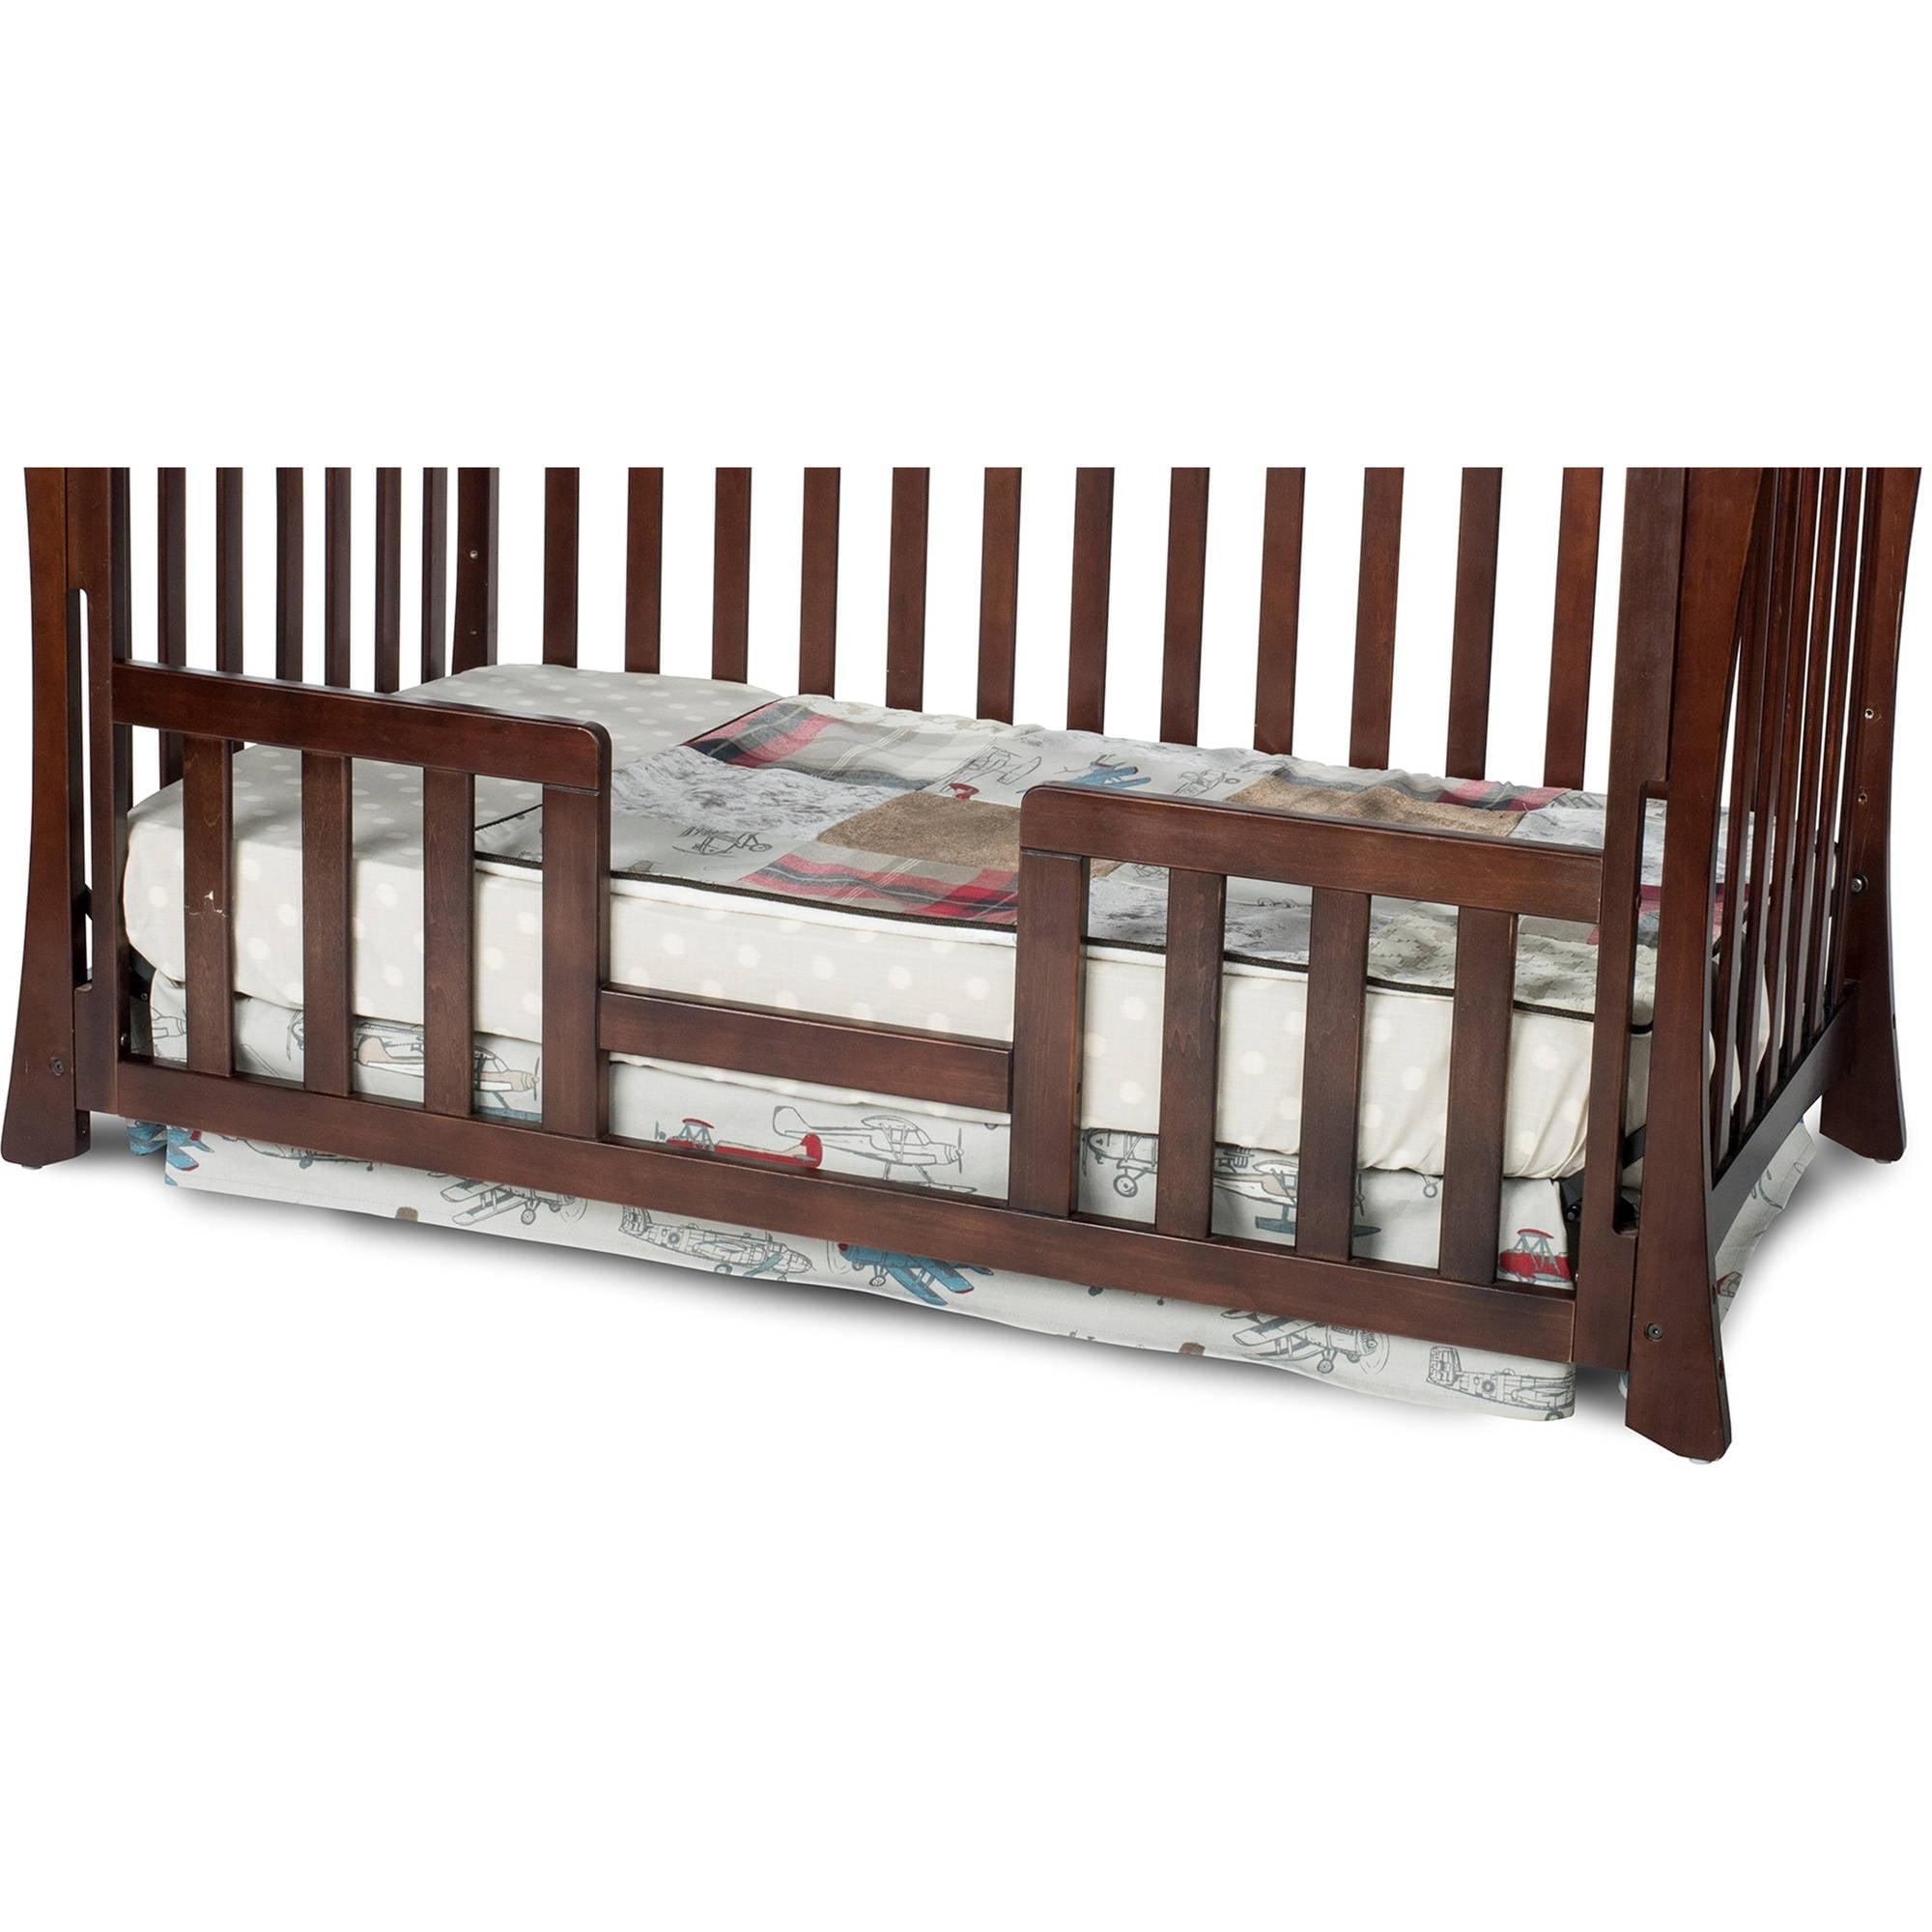 Child Craft Toddler Guard Rail for Parisian Crib, Select Cherry